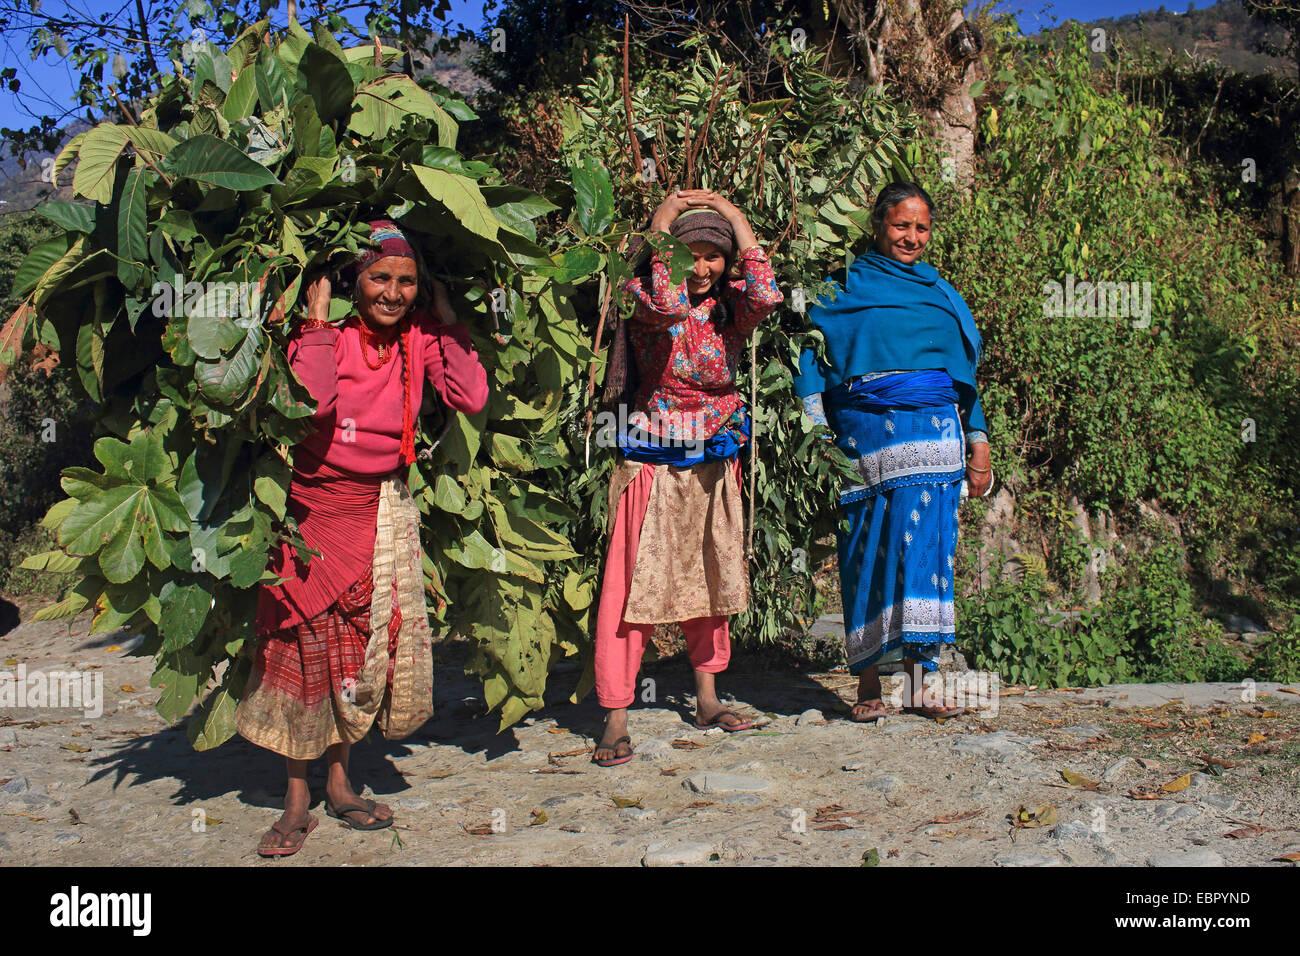 Las mujeres portadoras de un montón de alimento para las cabezas de ganado doméstico, Nepal, Pokhara Kathmandutal Imagen De Stock